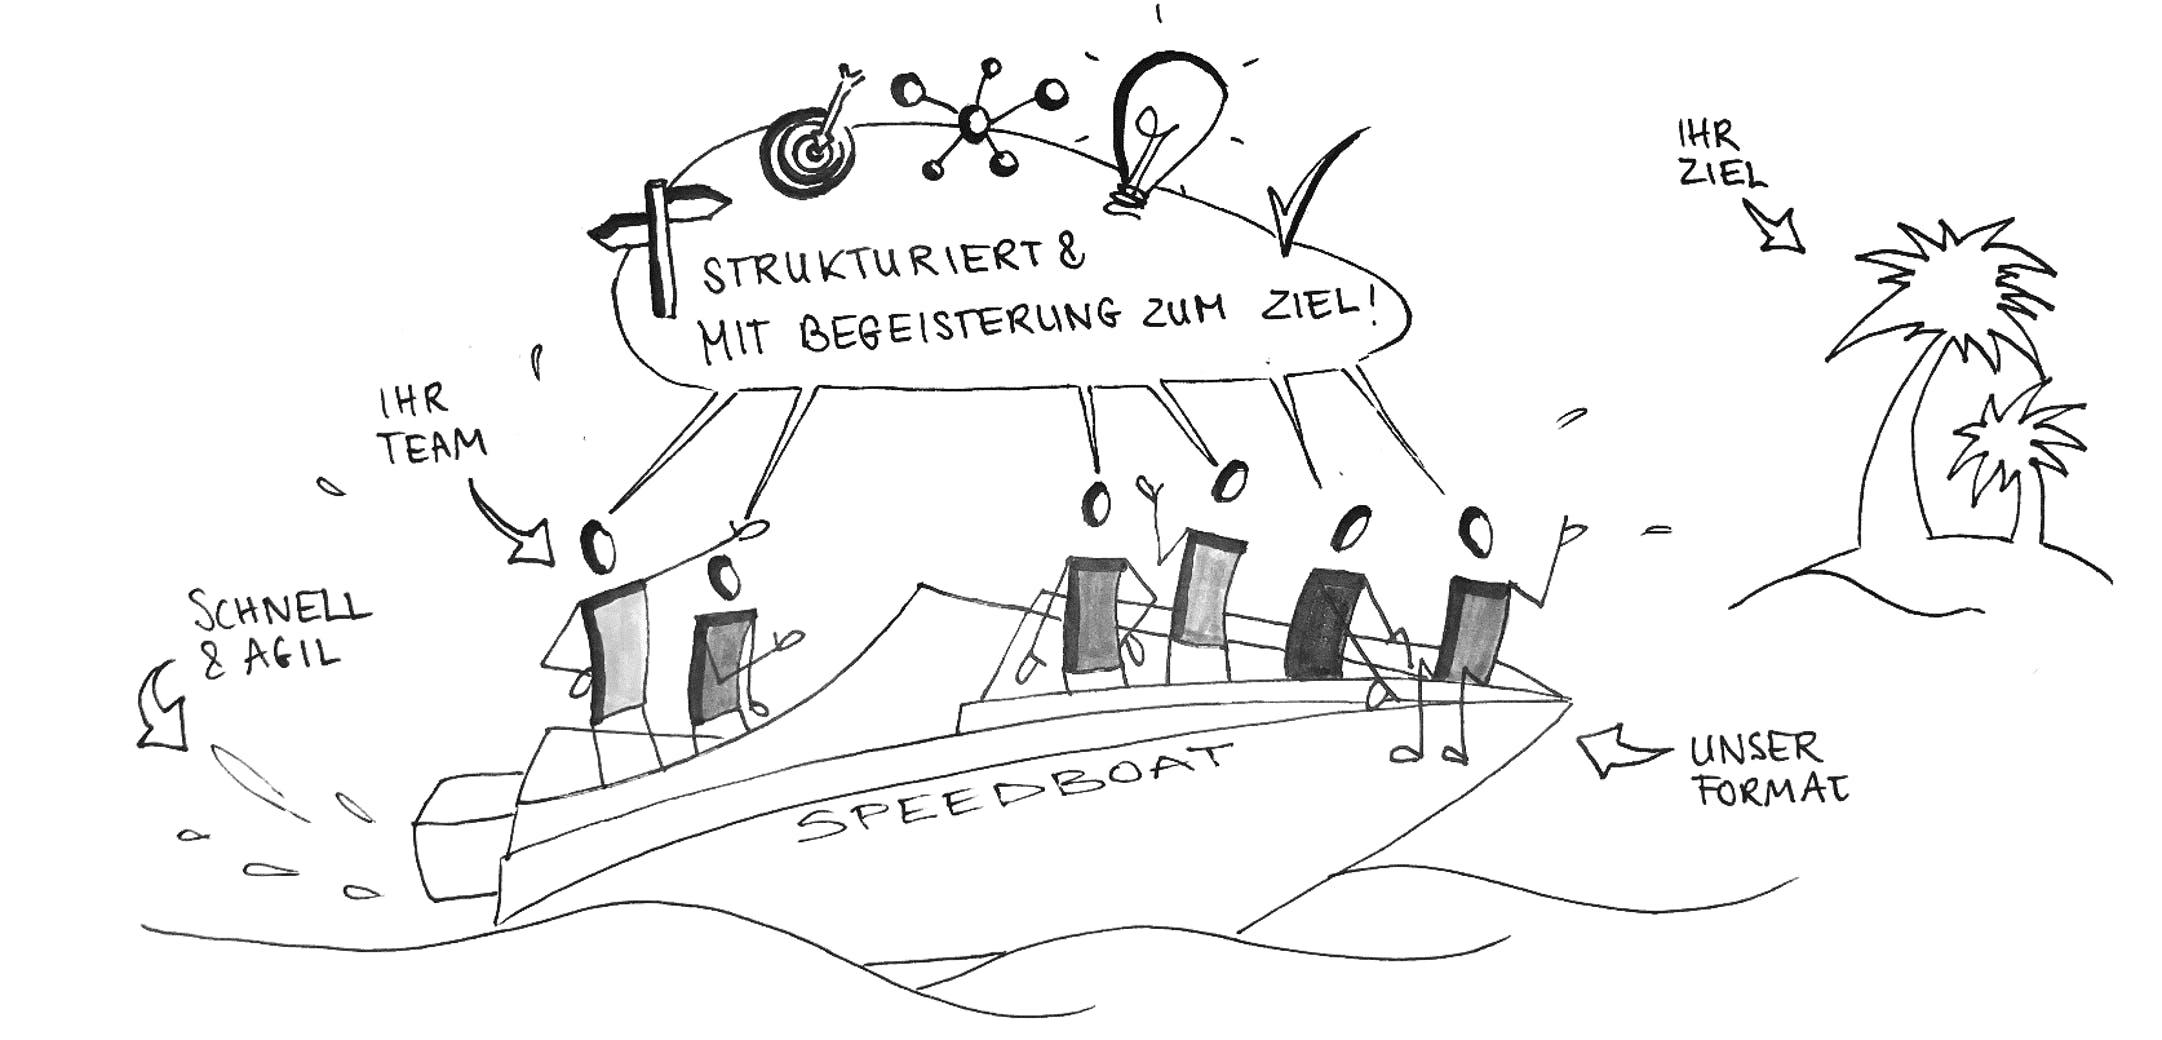 Leitwerk Academy Workshop Speedboat Format